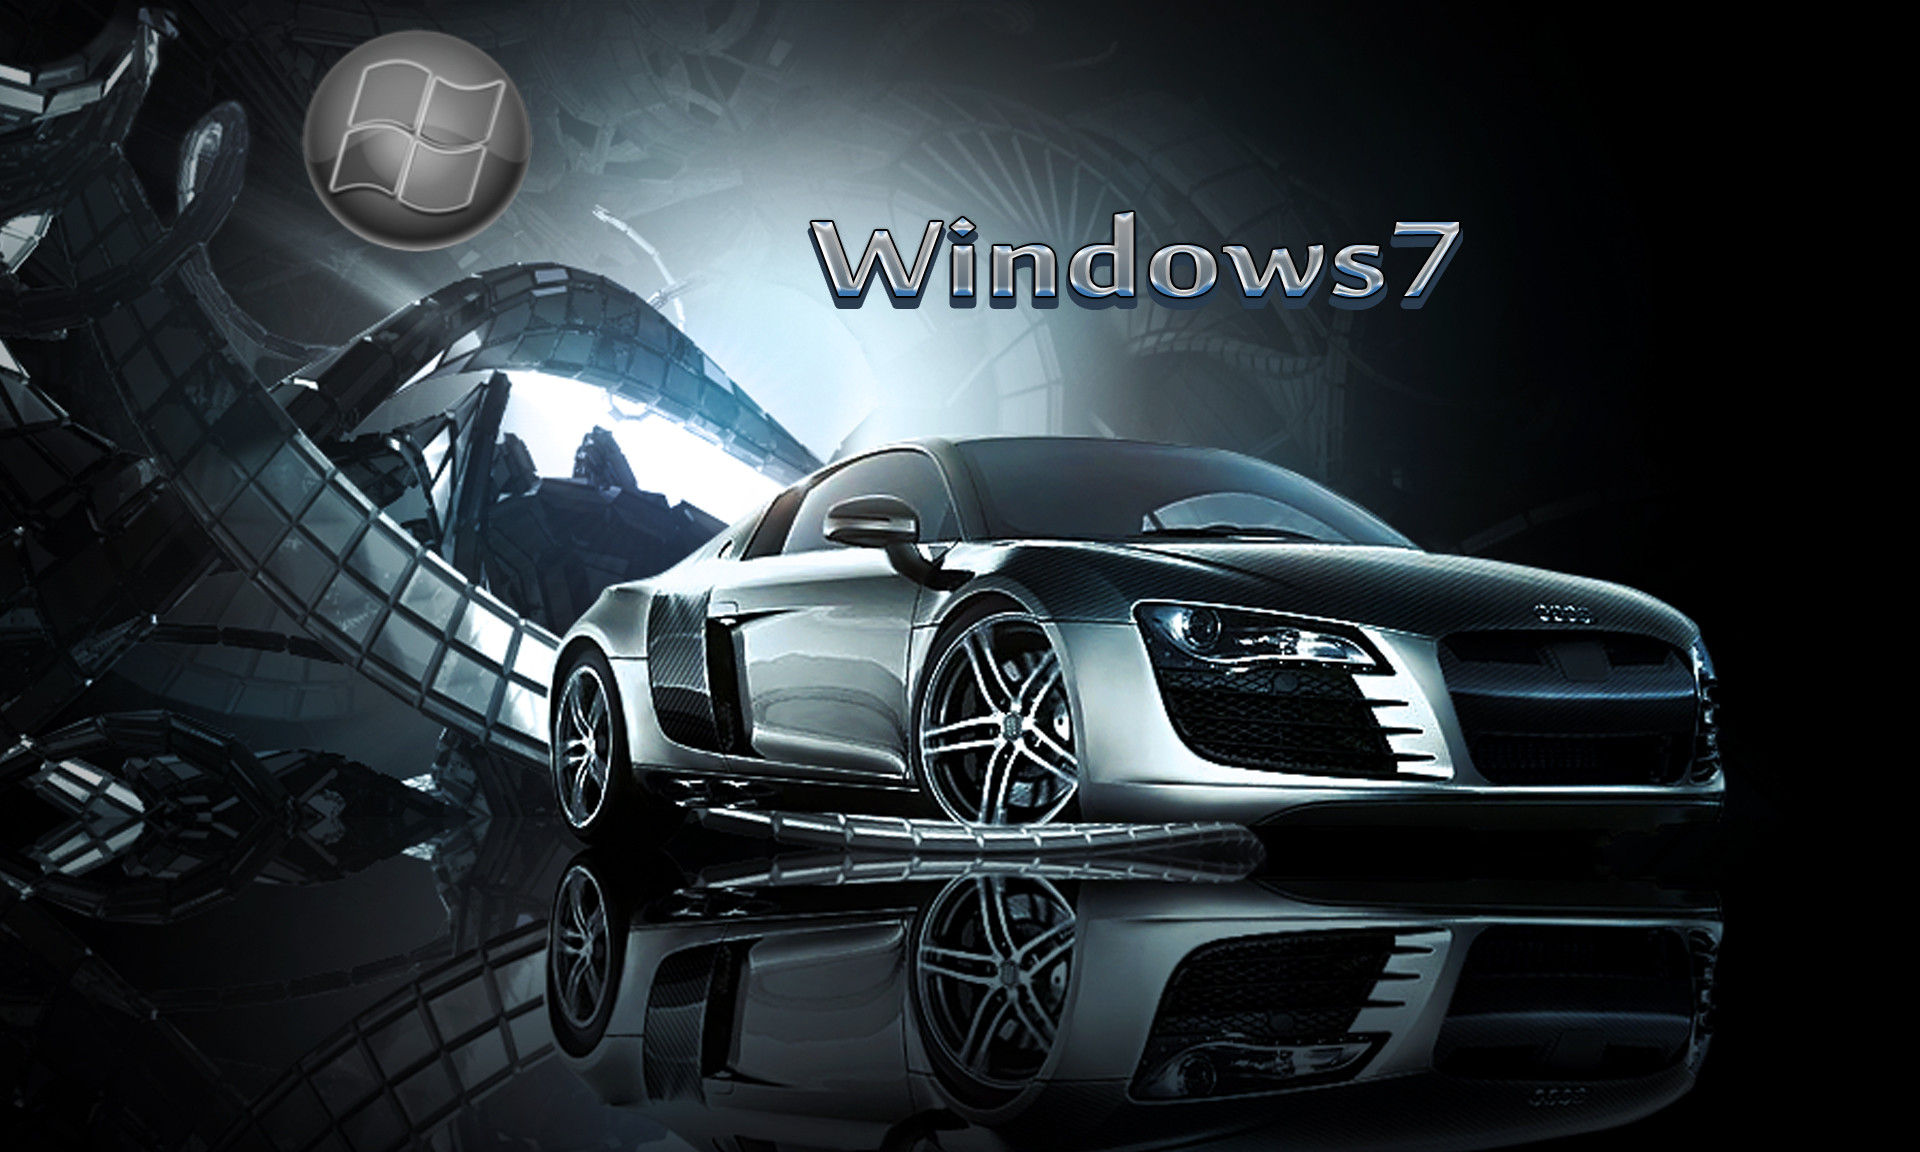 windows7 car wallpaper by kubines customization wallpaper mac pc os .